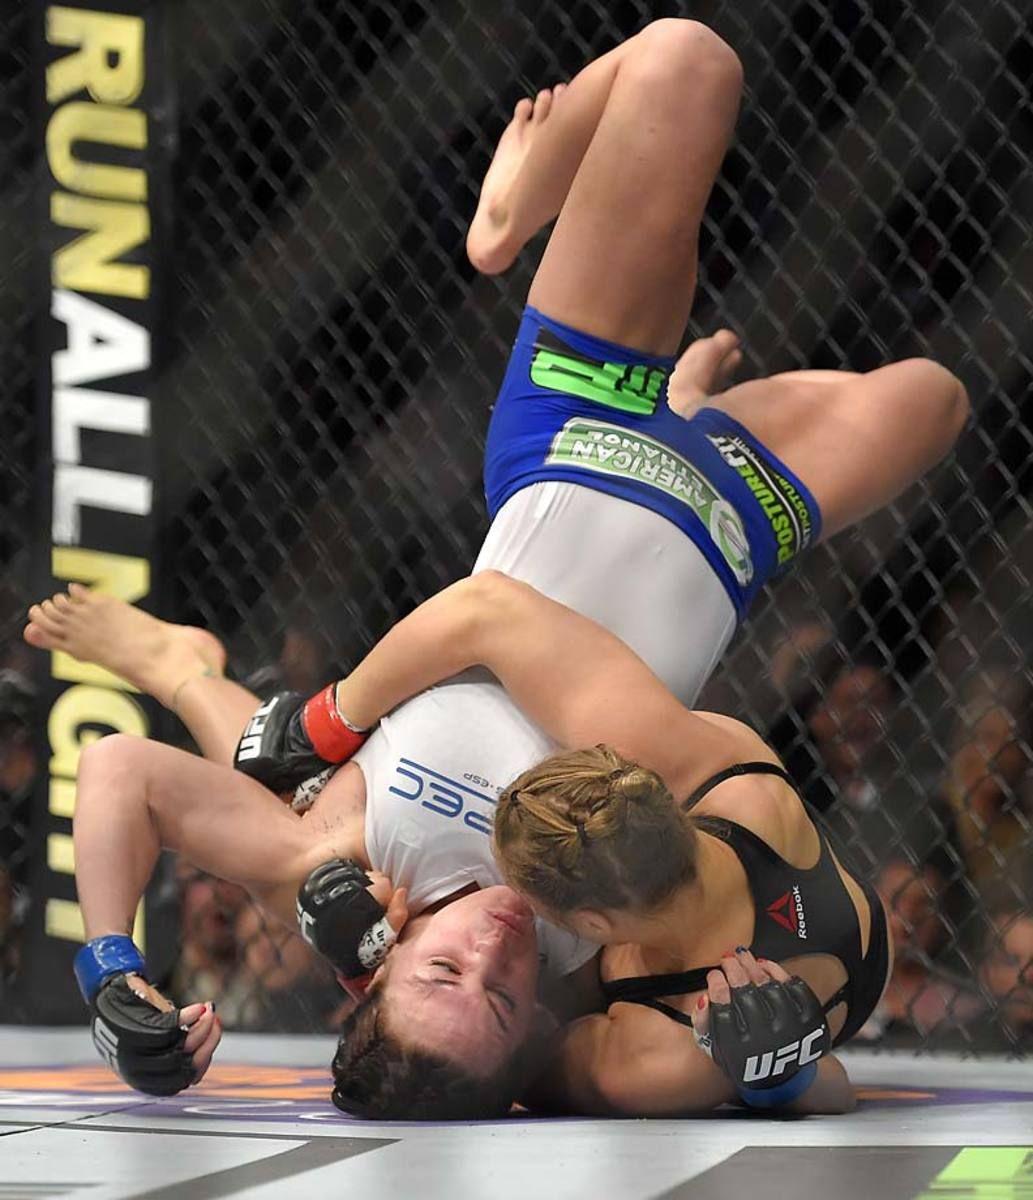 Ronda-Rousey-10.jpg